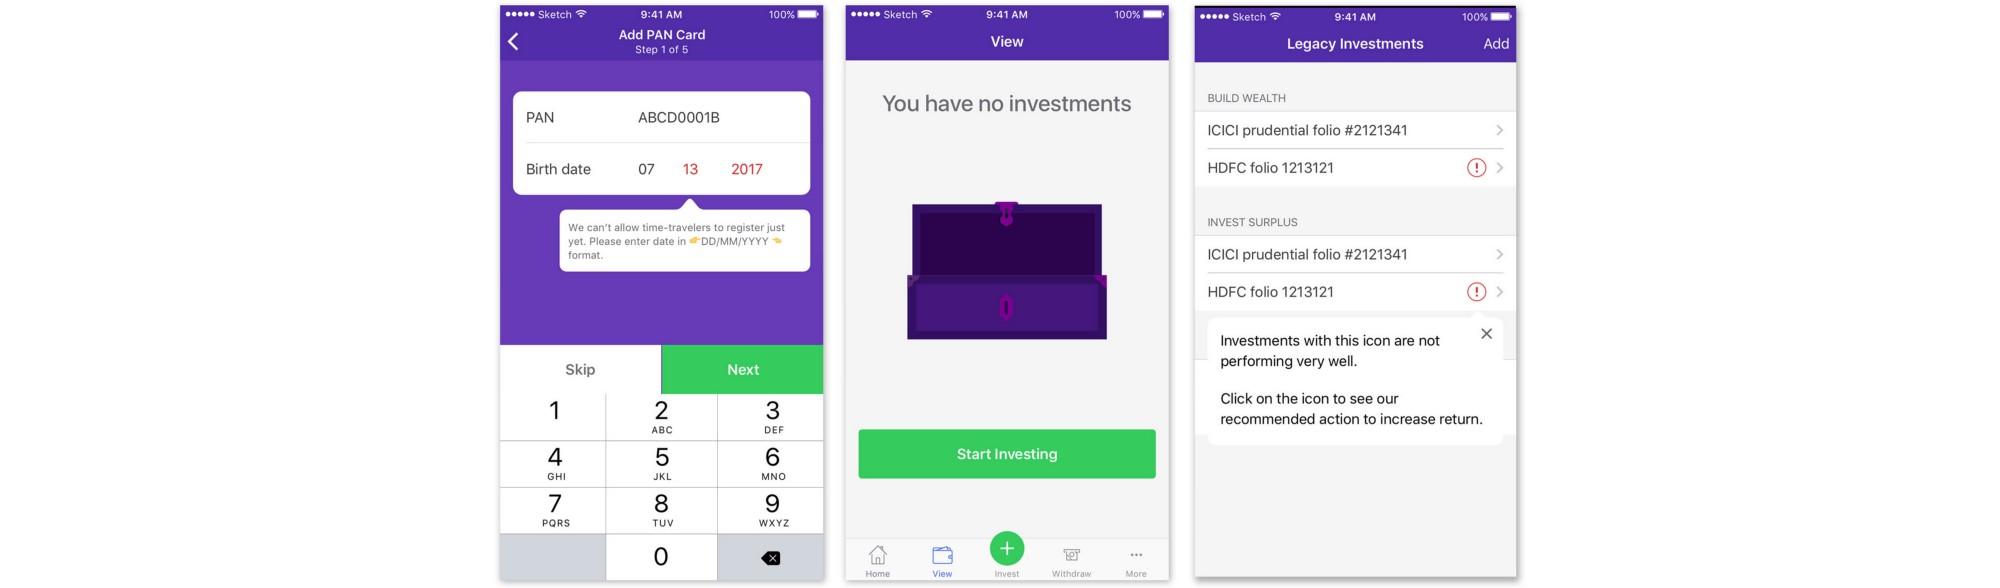 Finance tool design